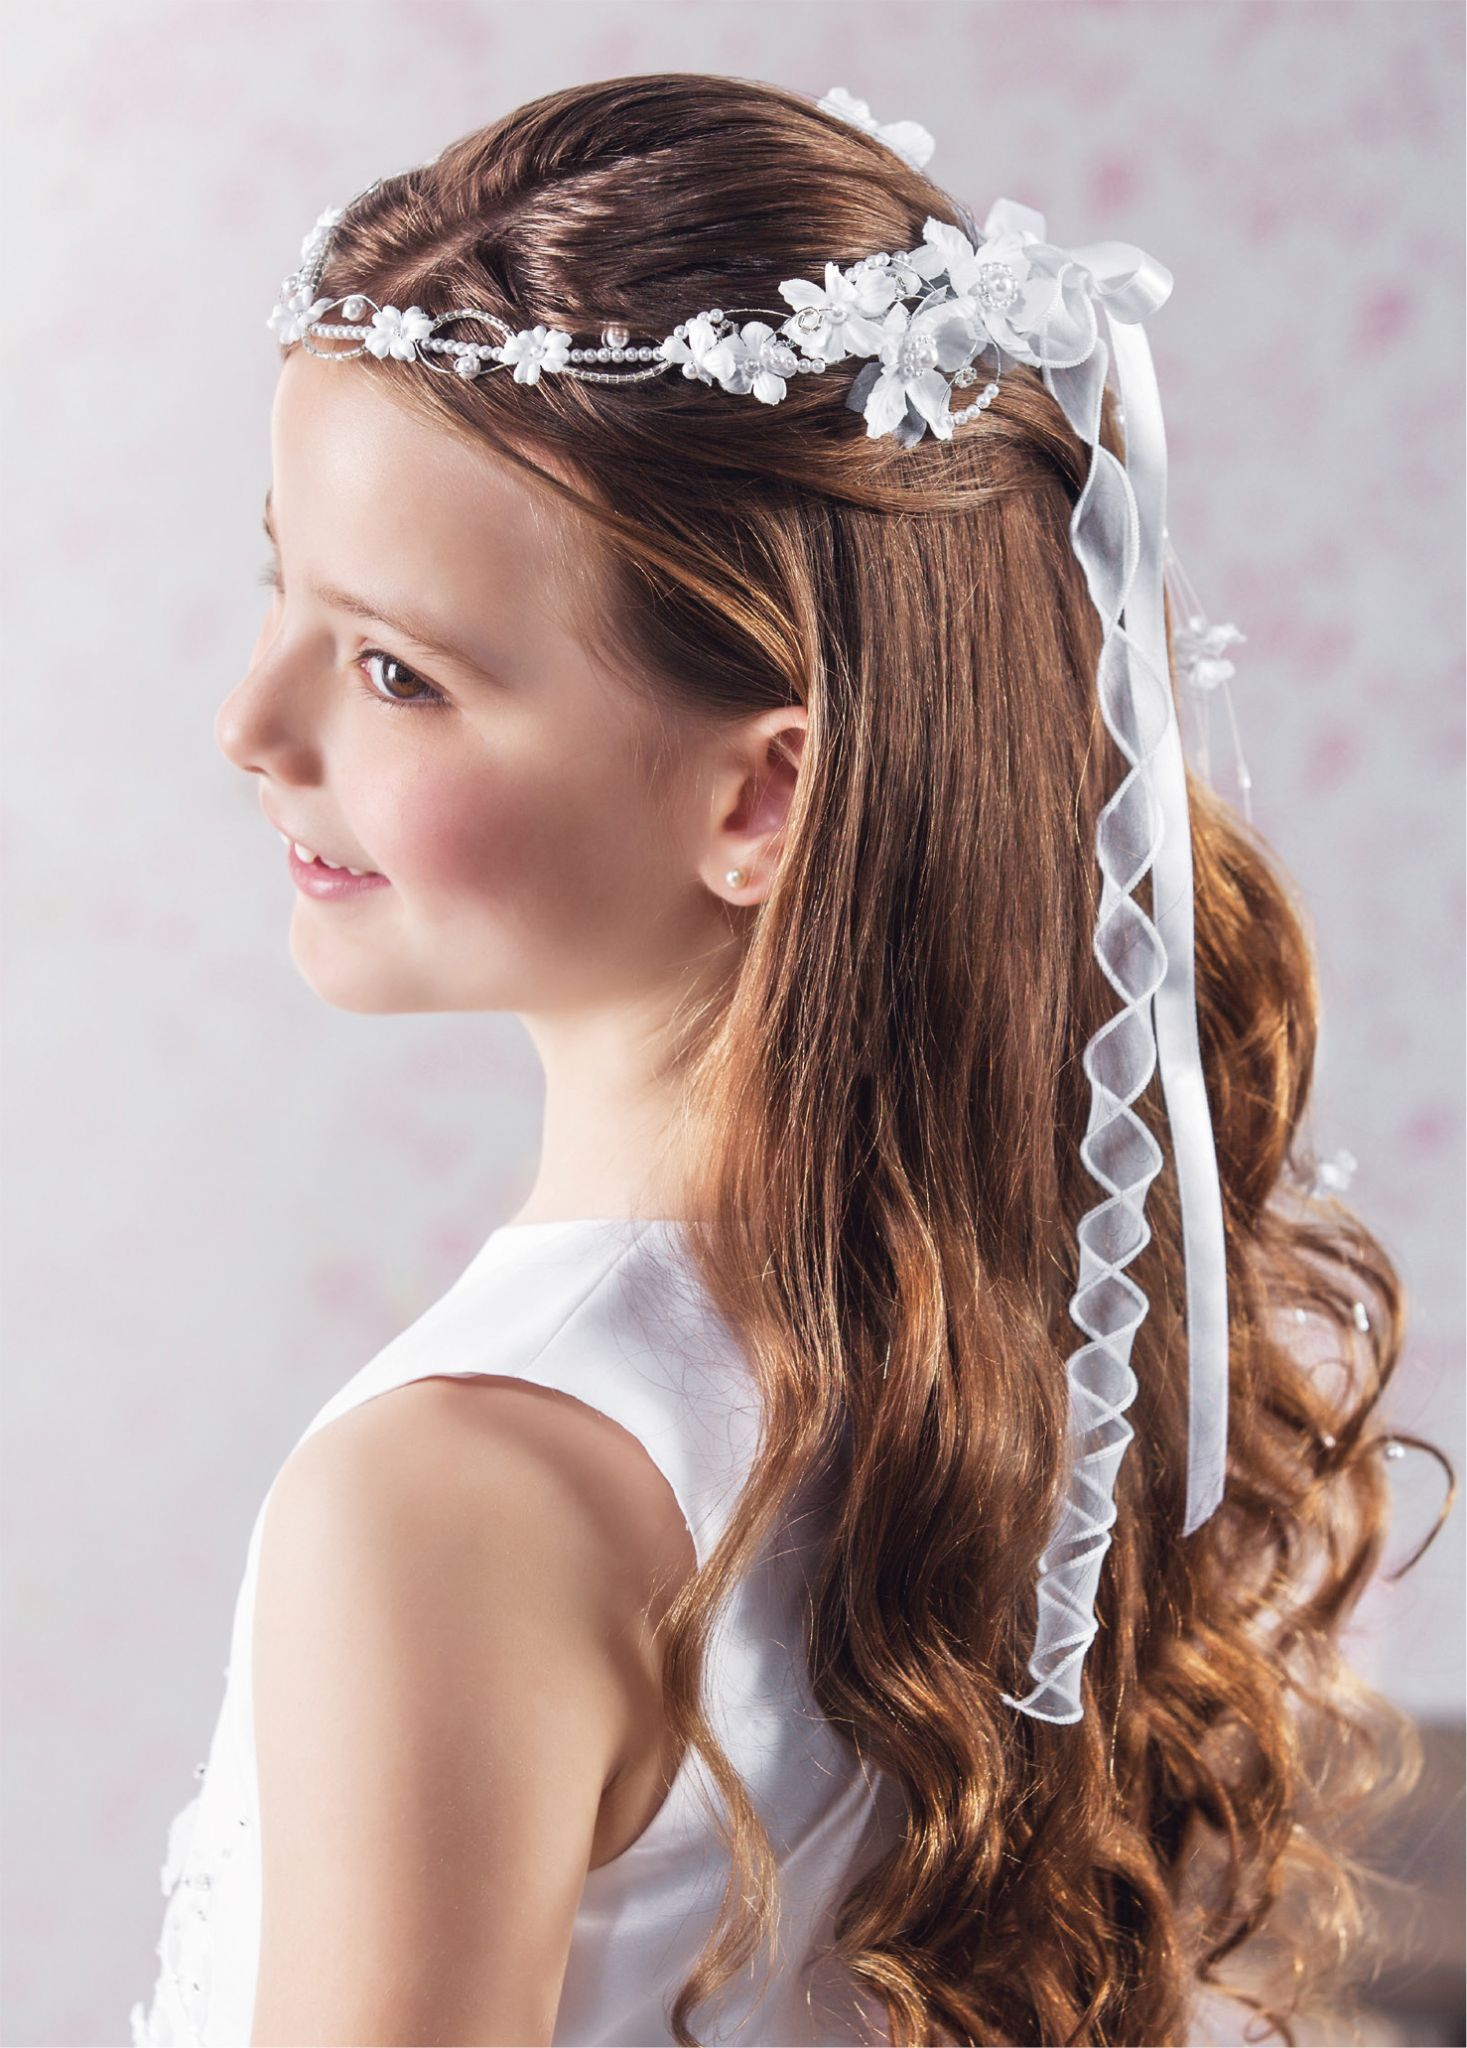 pin by monika janus on komunijne | communion hairstyles